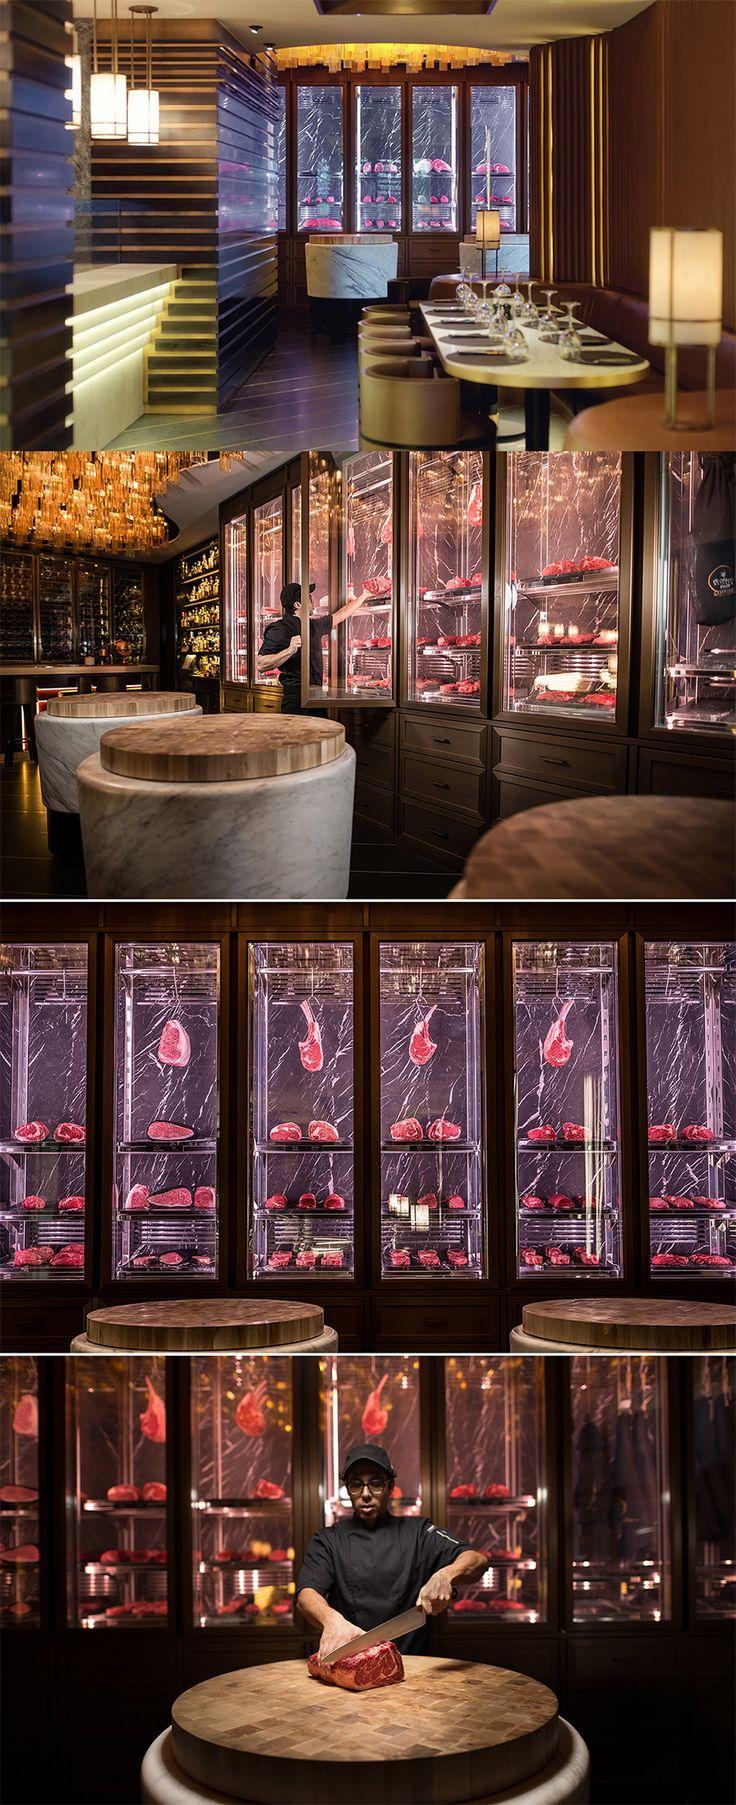 The Beefbar Butcher Shop, Monaco http://thecoolhunter.net/the-beefbar-butcher-shop-monaco/